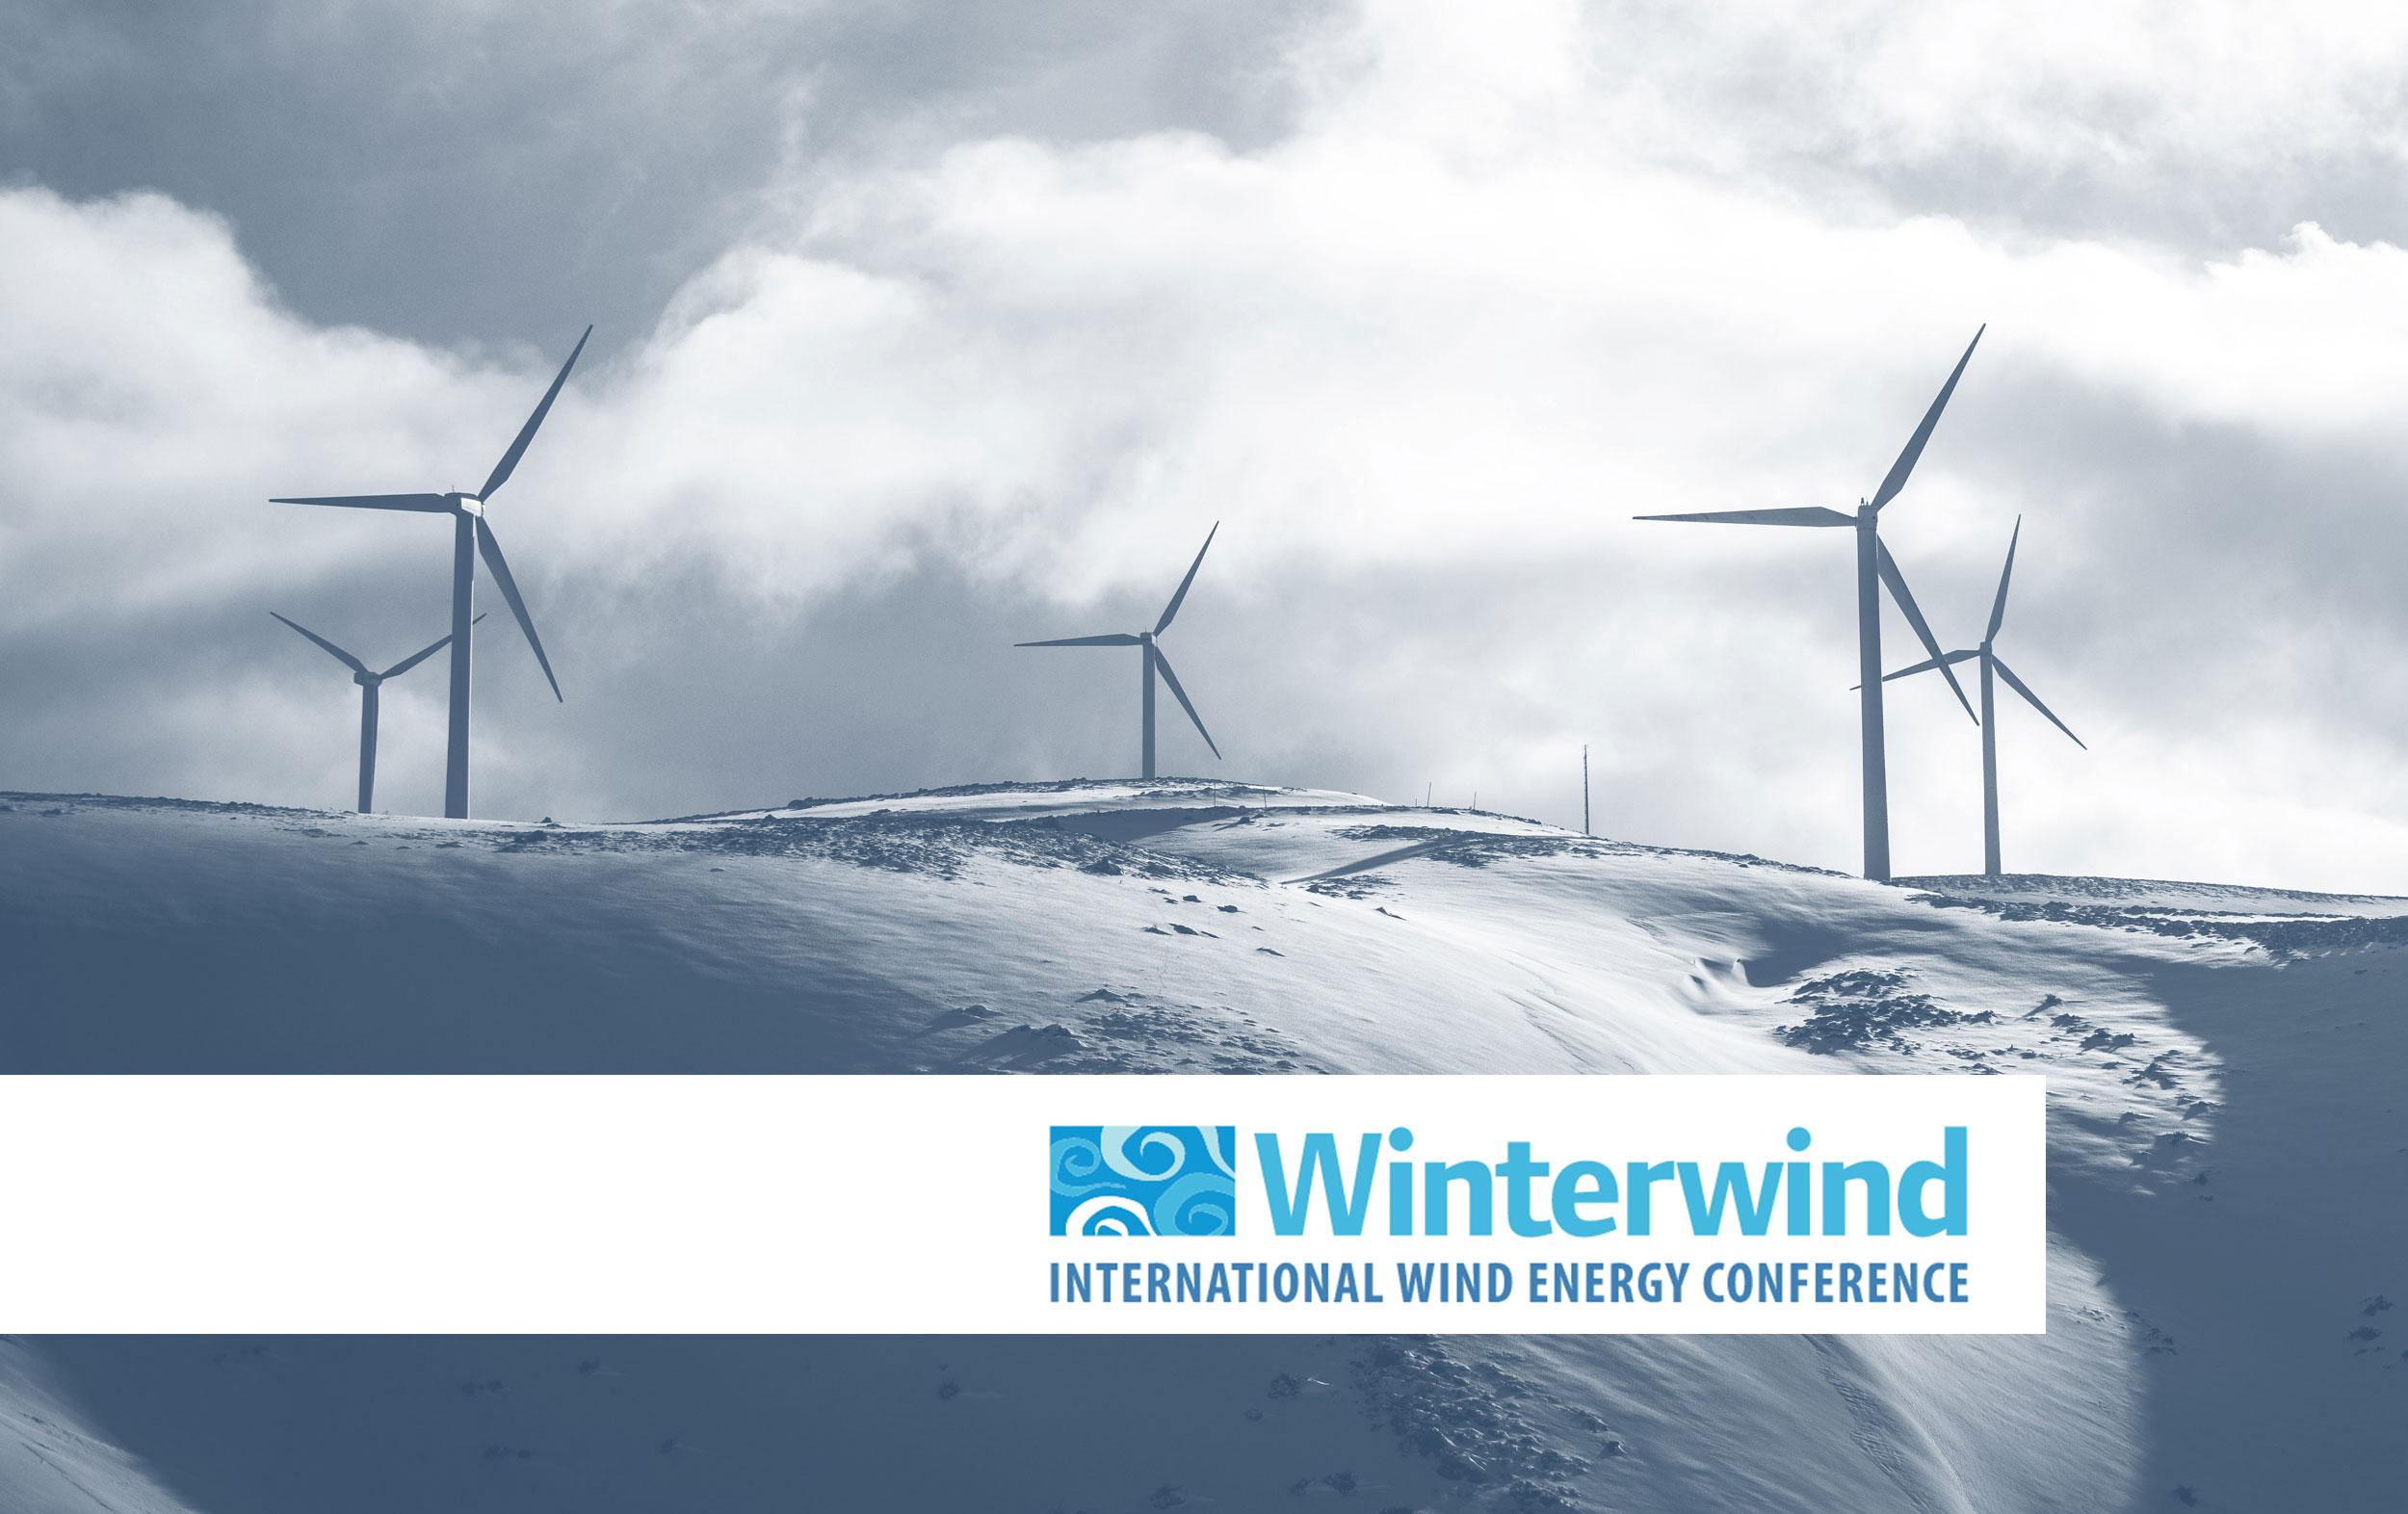 Winterwind 2021